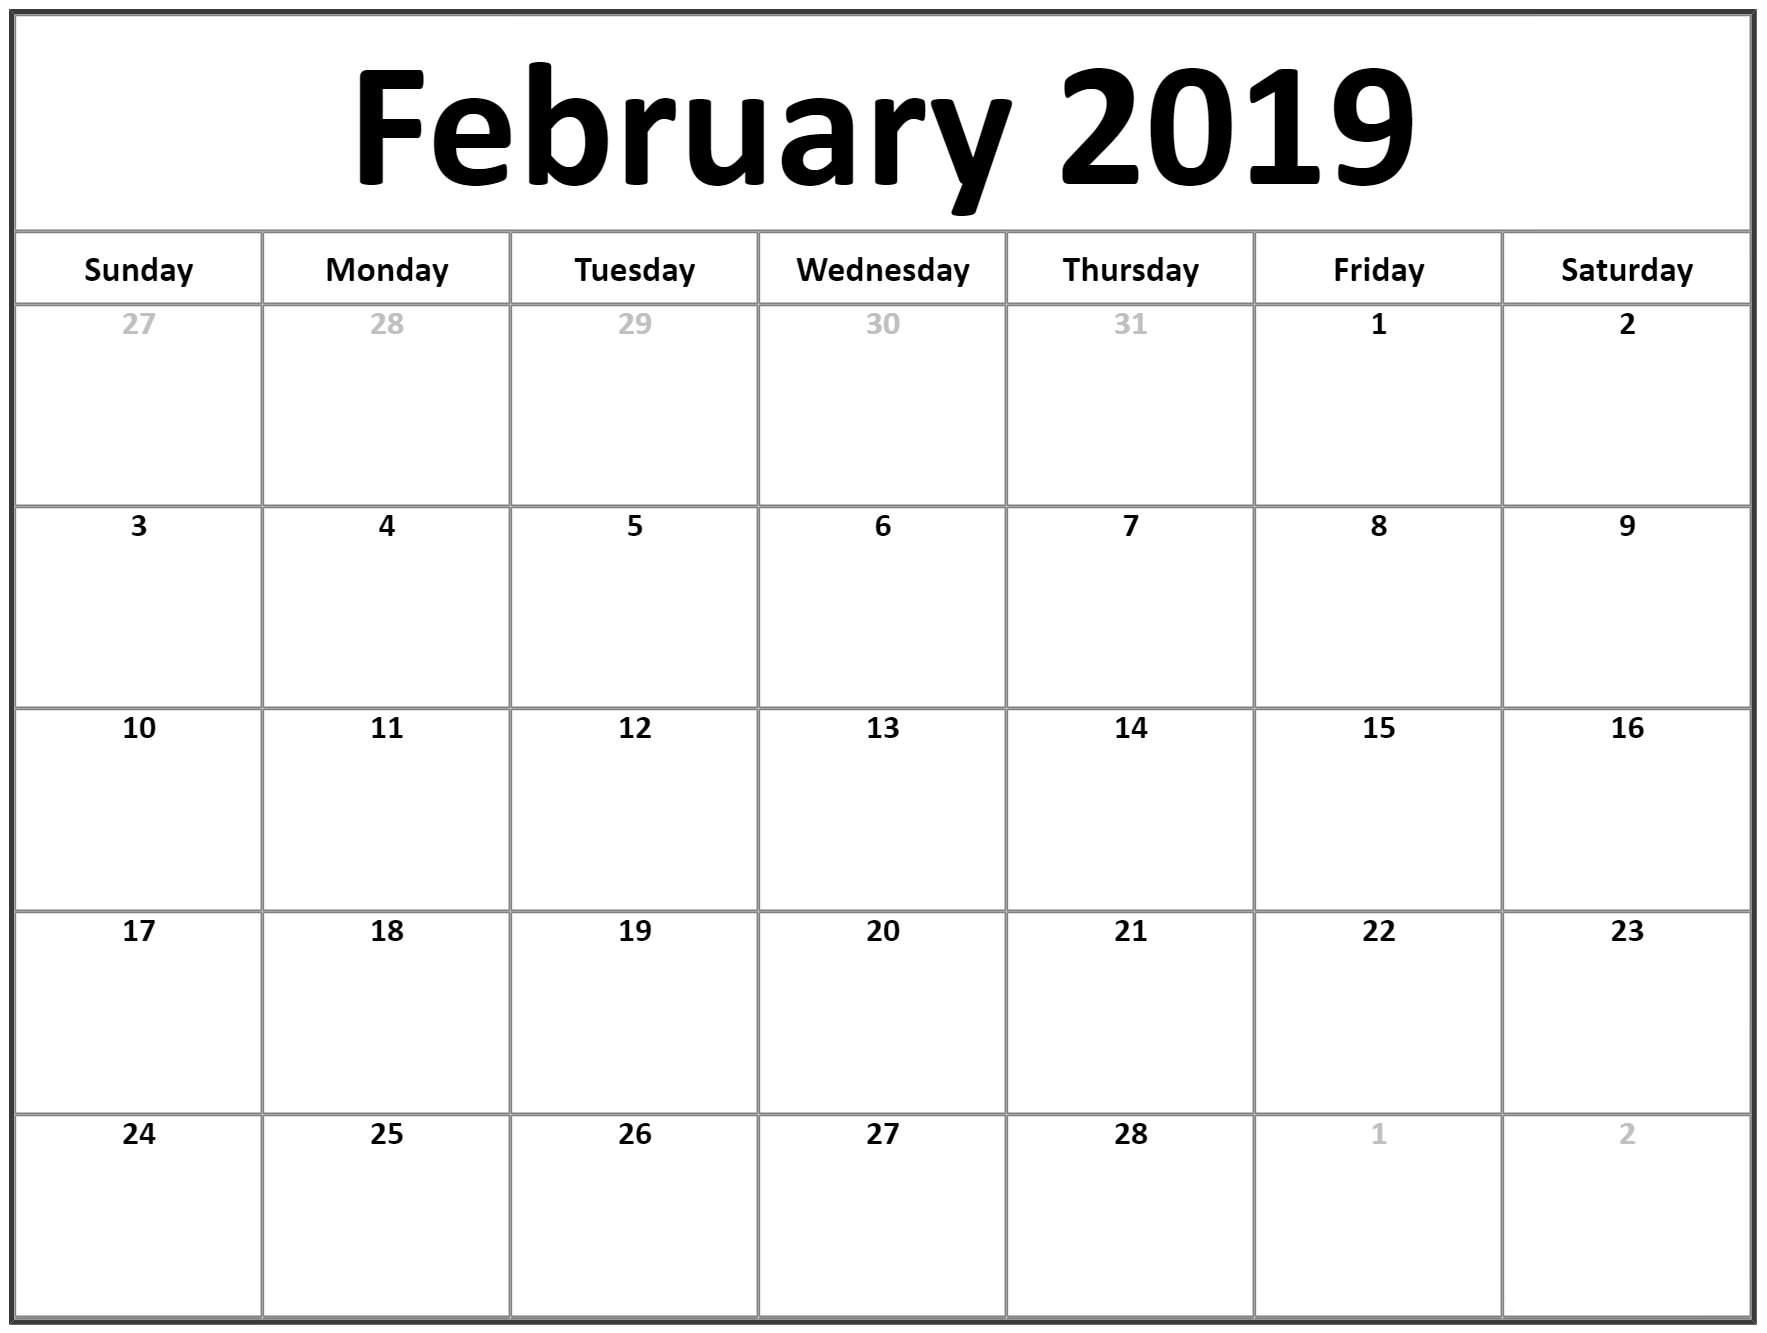 February Calendar 2019 For Office February Calendar 2019 Manage